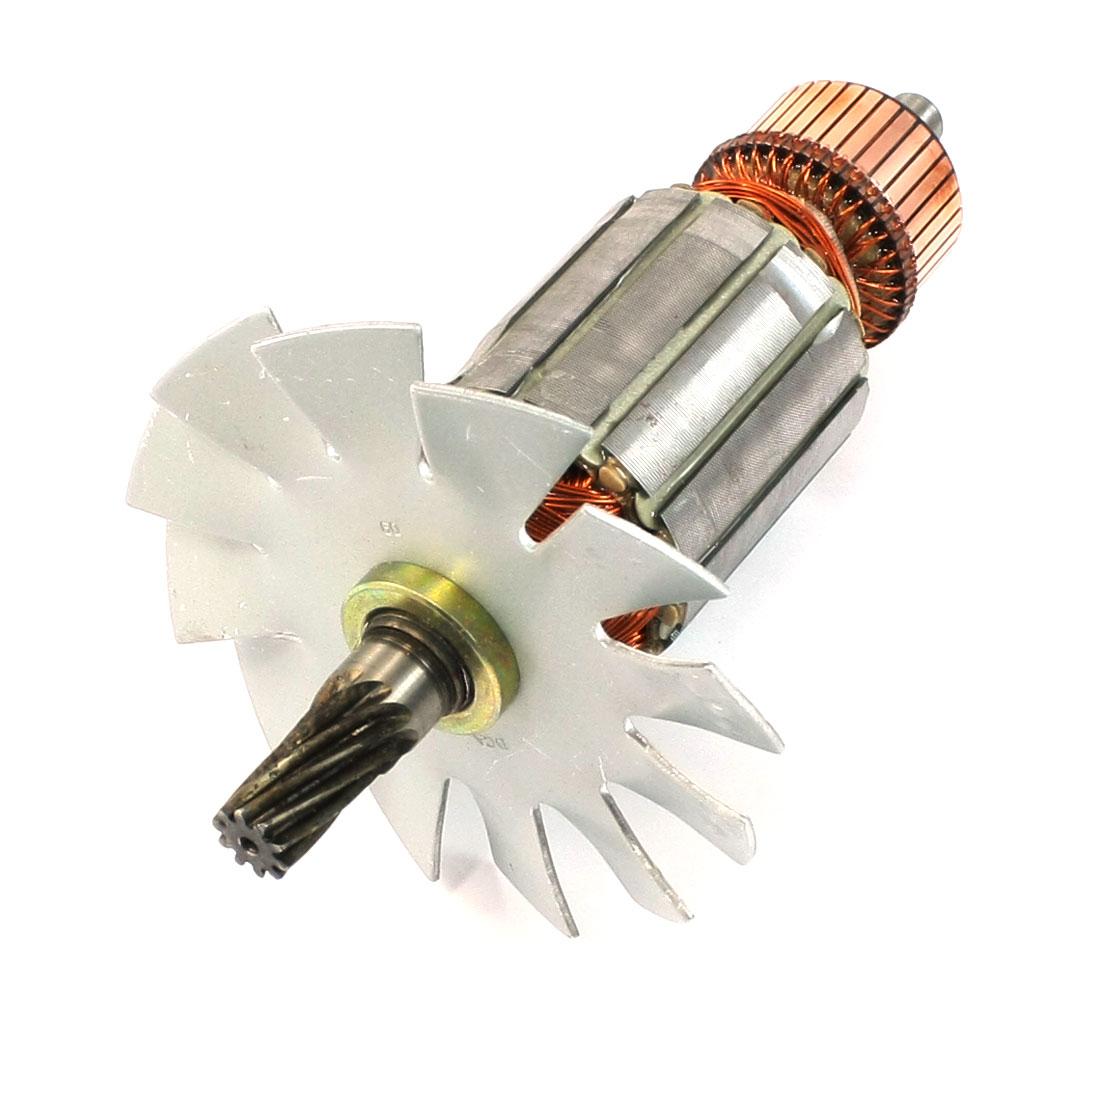 AC 220V 12mm Drive Shaft 6 Teeth Rotor Armature for Makita 5103N 5201N Circular Saw